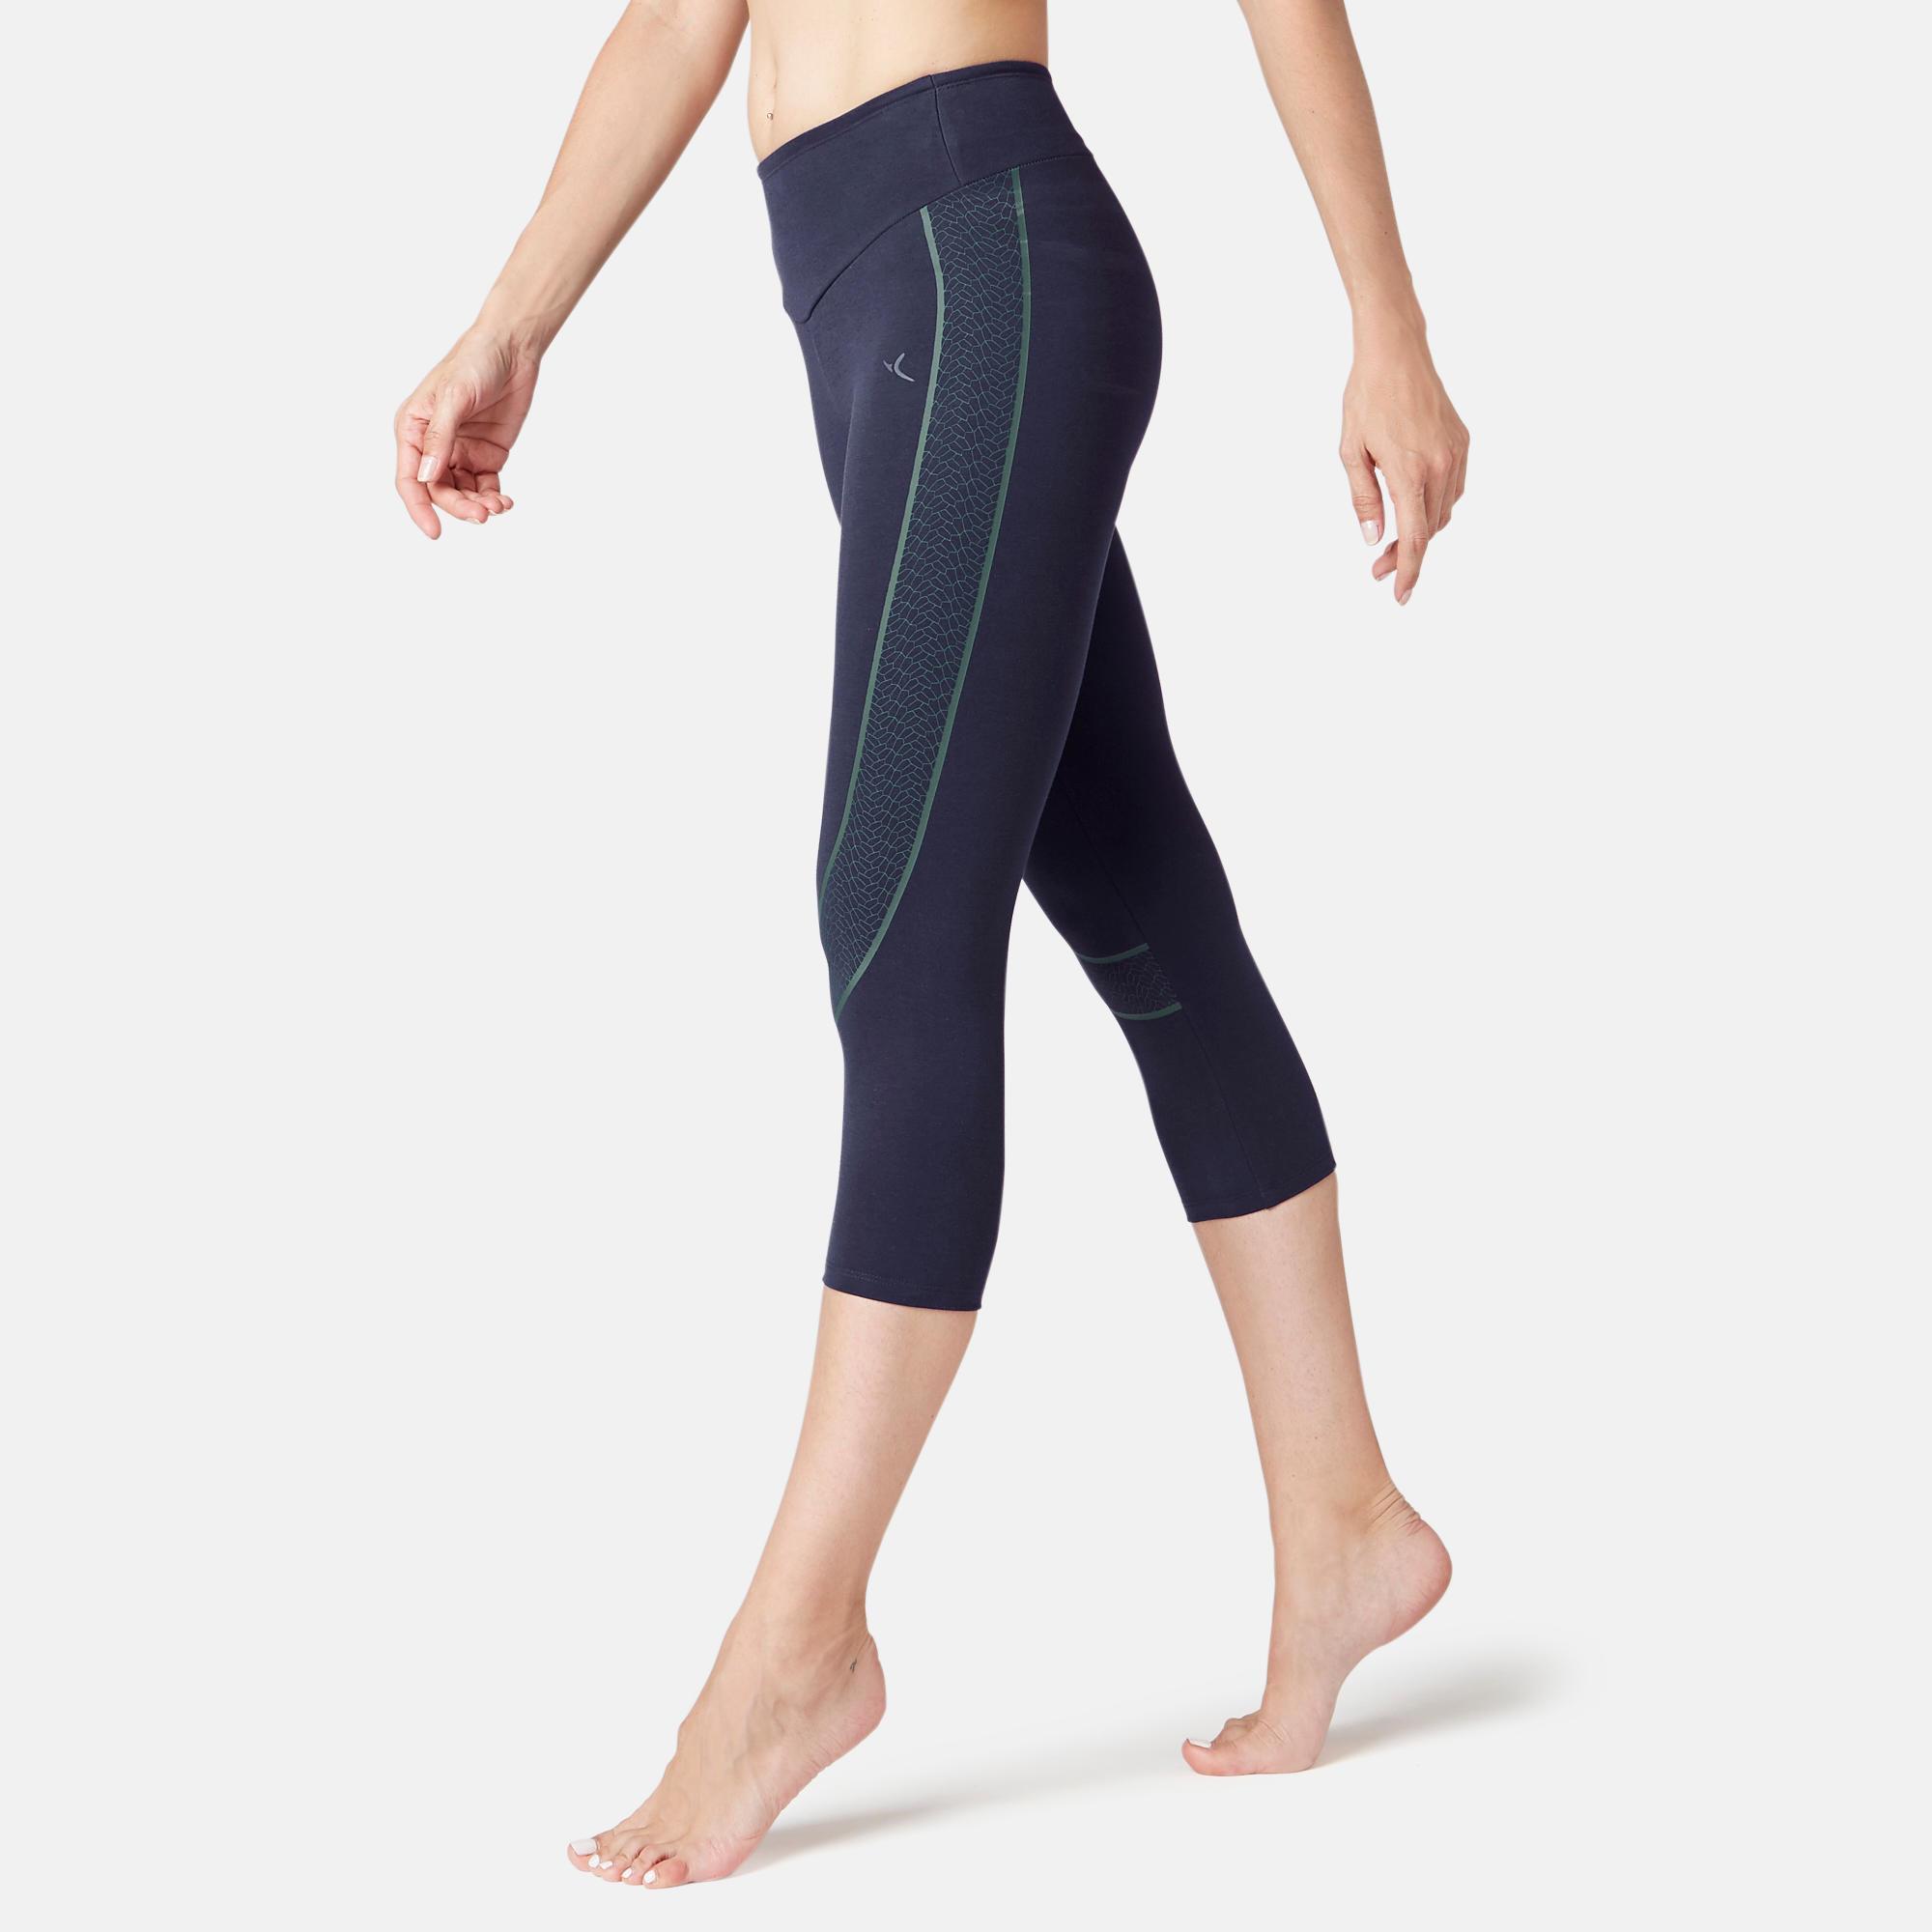 7/8-Hose 560 Slim Pilates sanfte Gymnastik Damen marineblau | Bekleidung > Hosen > 7/8-Hosen | Blau | Domyos